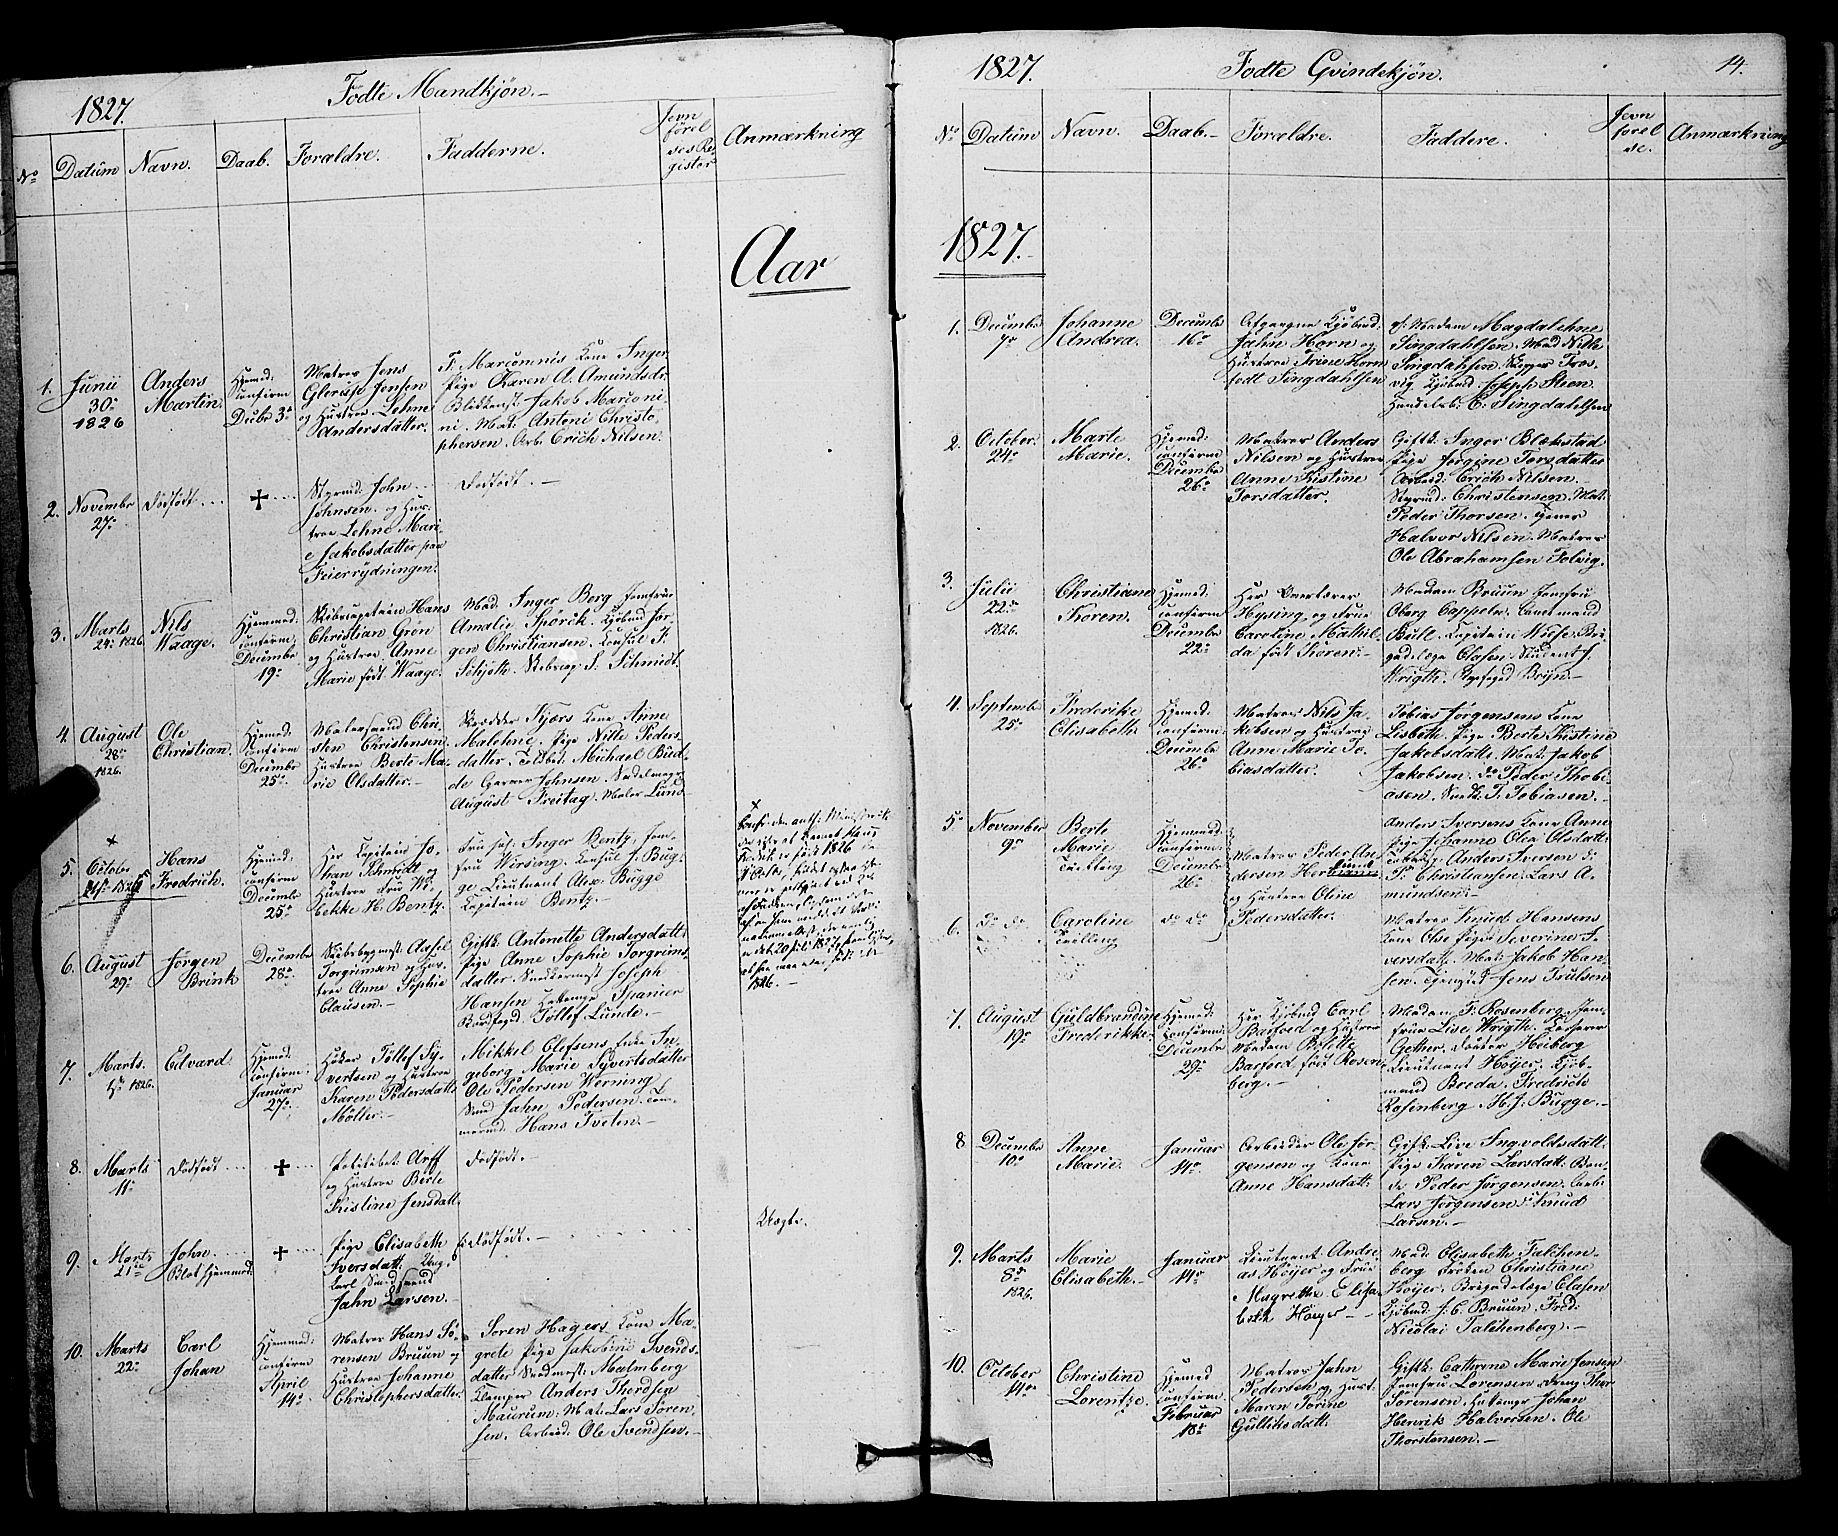 SAKO, Larvik kirkebøker, F/Fa/L0002: Ministerialbok nr. I 2, 1825-1847, s. 14